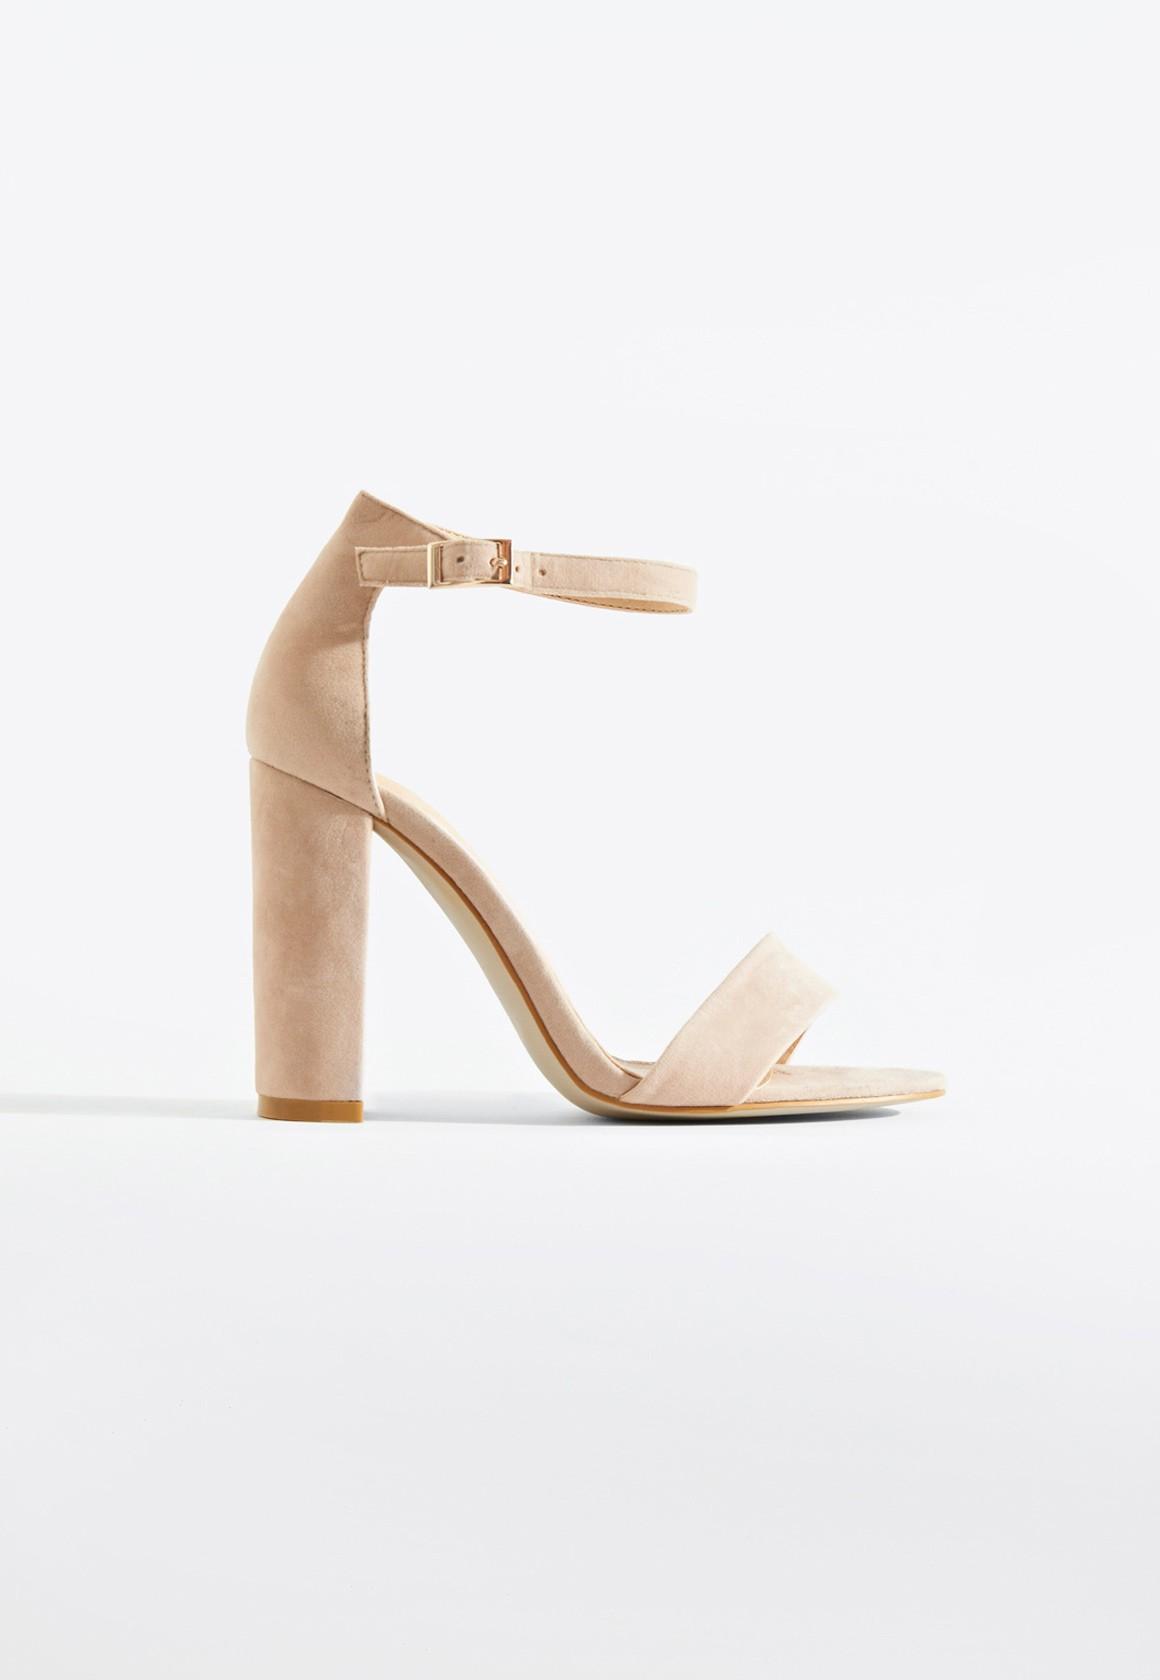 49e0dd87db7 Sarah Basic Single Strap Block Heel Sandal Nude